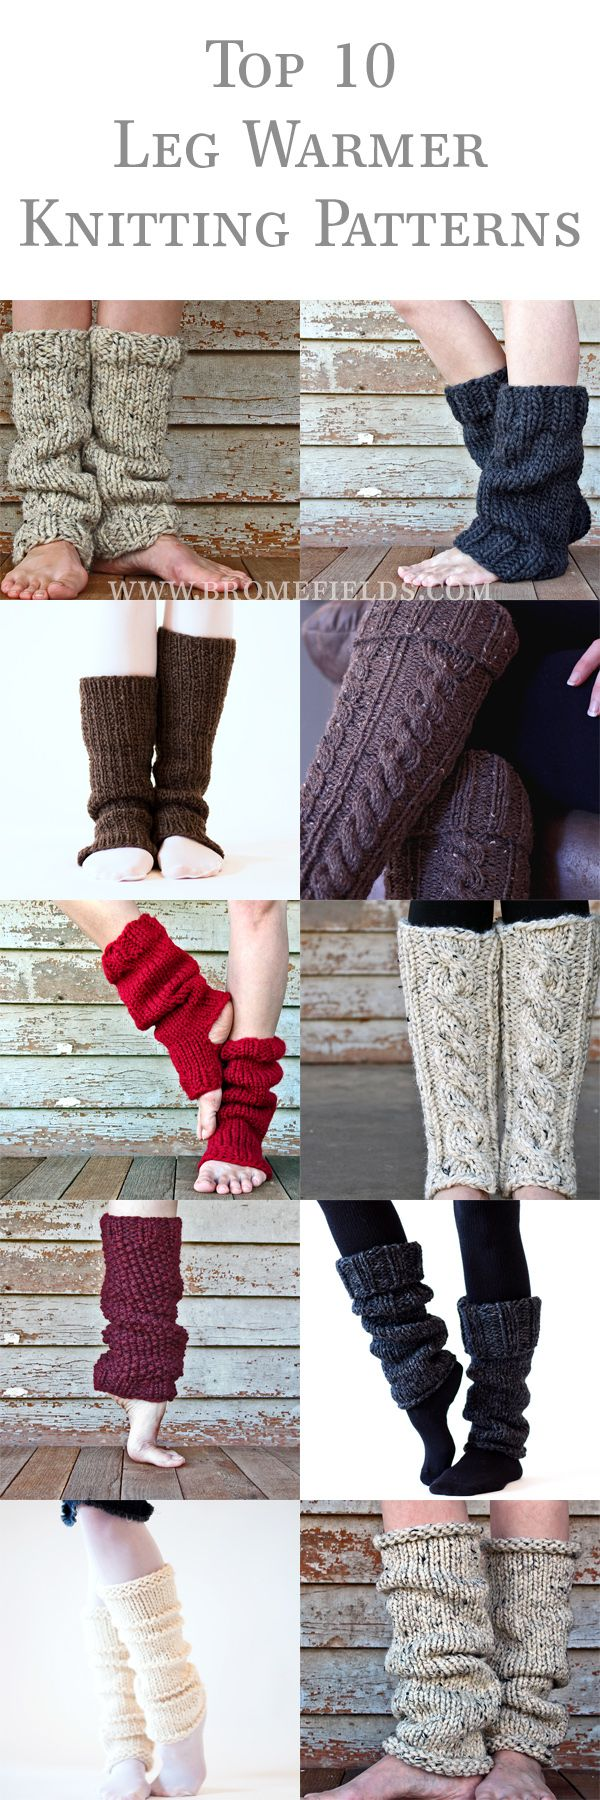 Top 10 Leg Warmer Knitting Patterns by Brome Fields